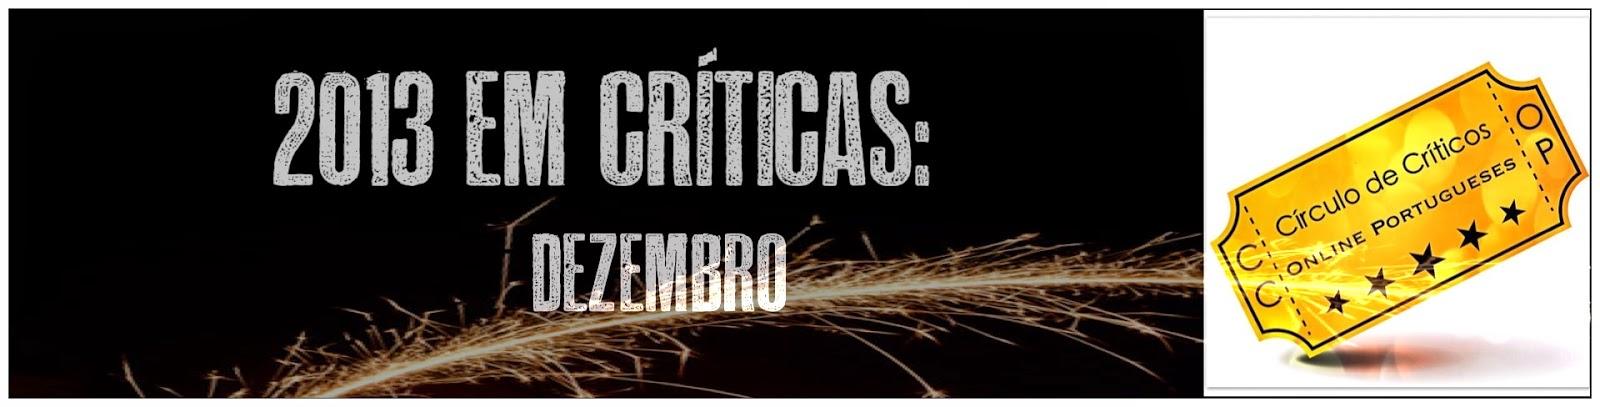 http://ccopblogue.blogspot.pt/2014/10/2013-em-criticas-dezembro.html